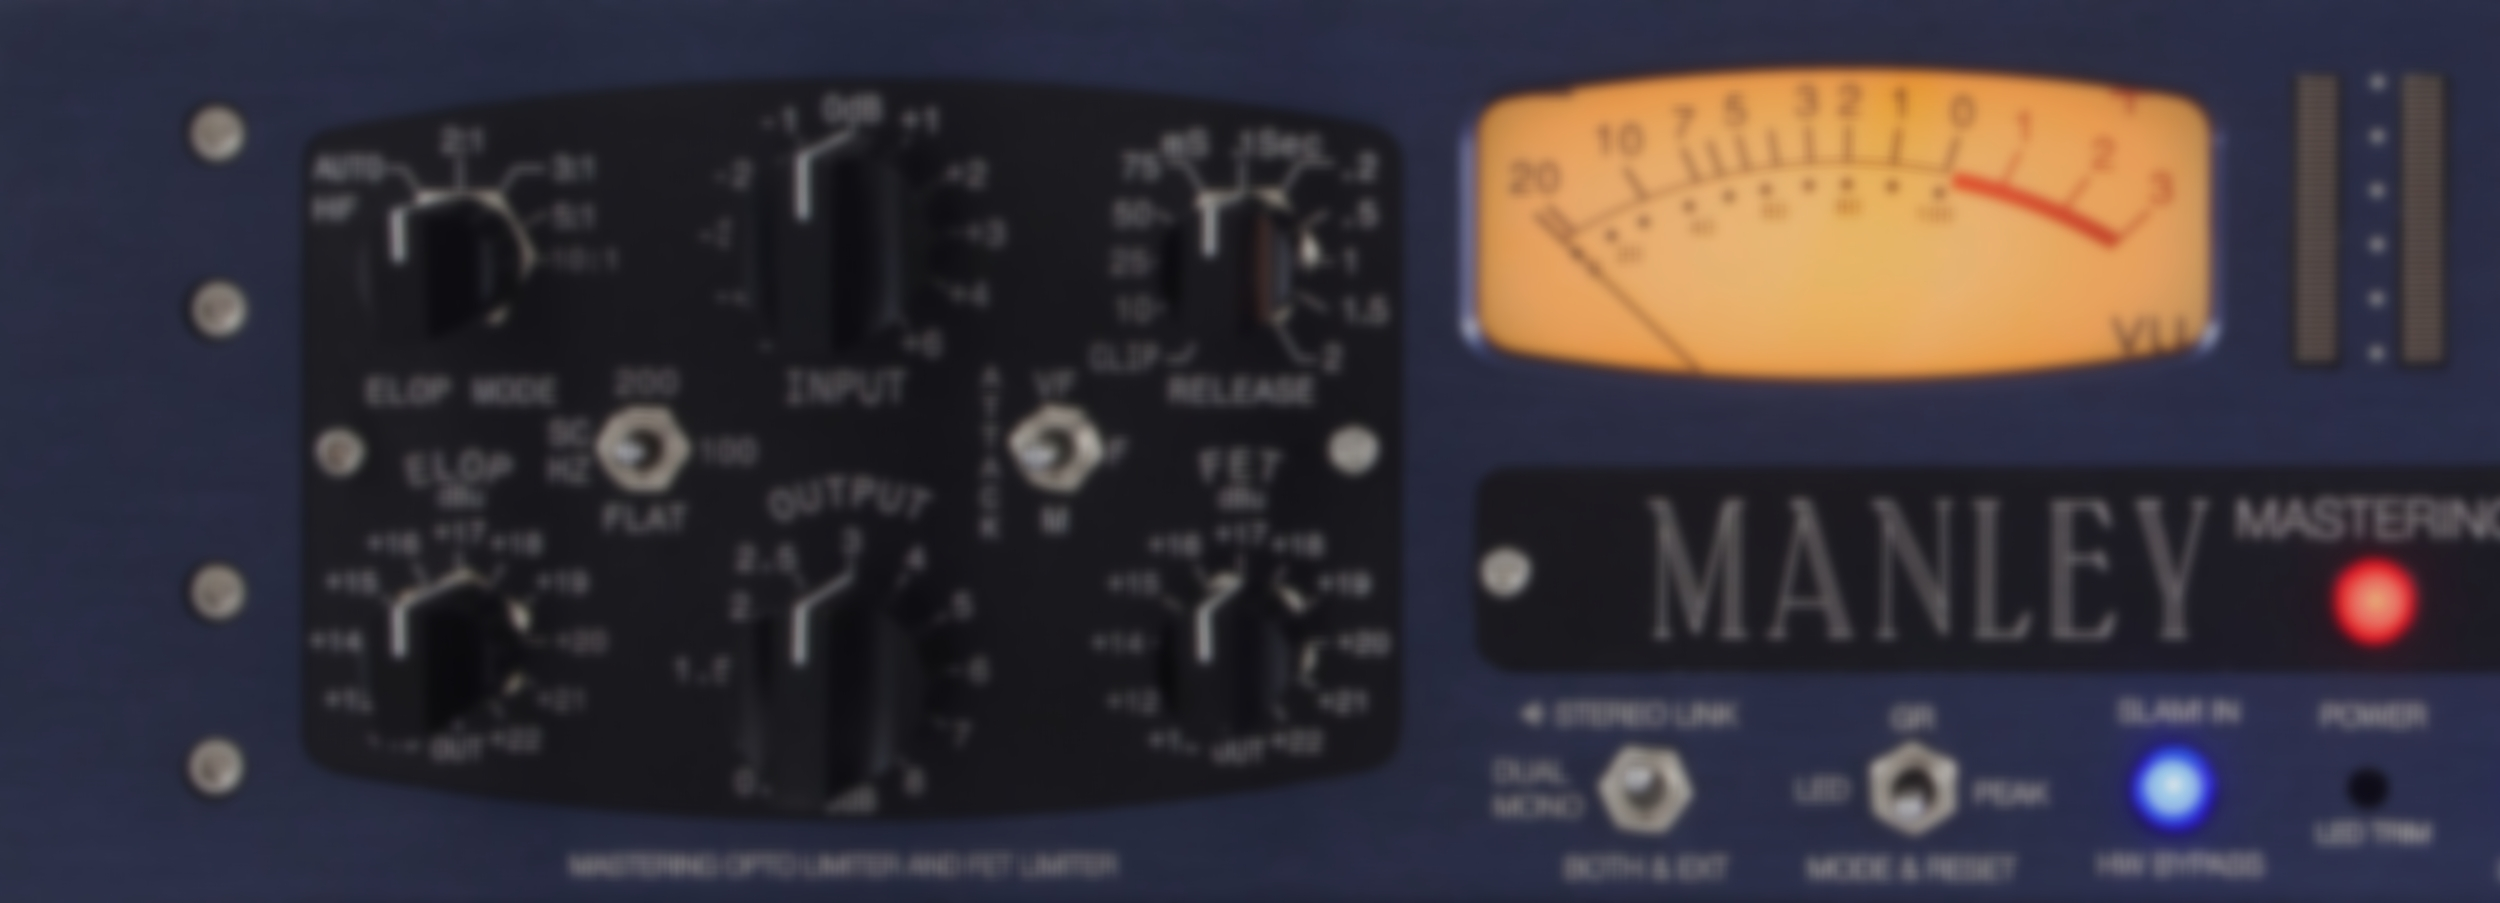 Manley Slam Stereo Limiter And Micpre Laboratories Inc Audio Vu Meter Mono Circuit Mmslam Header